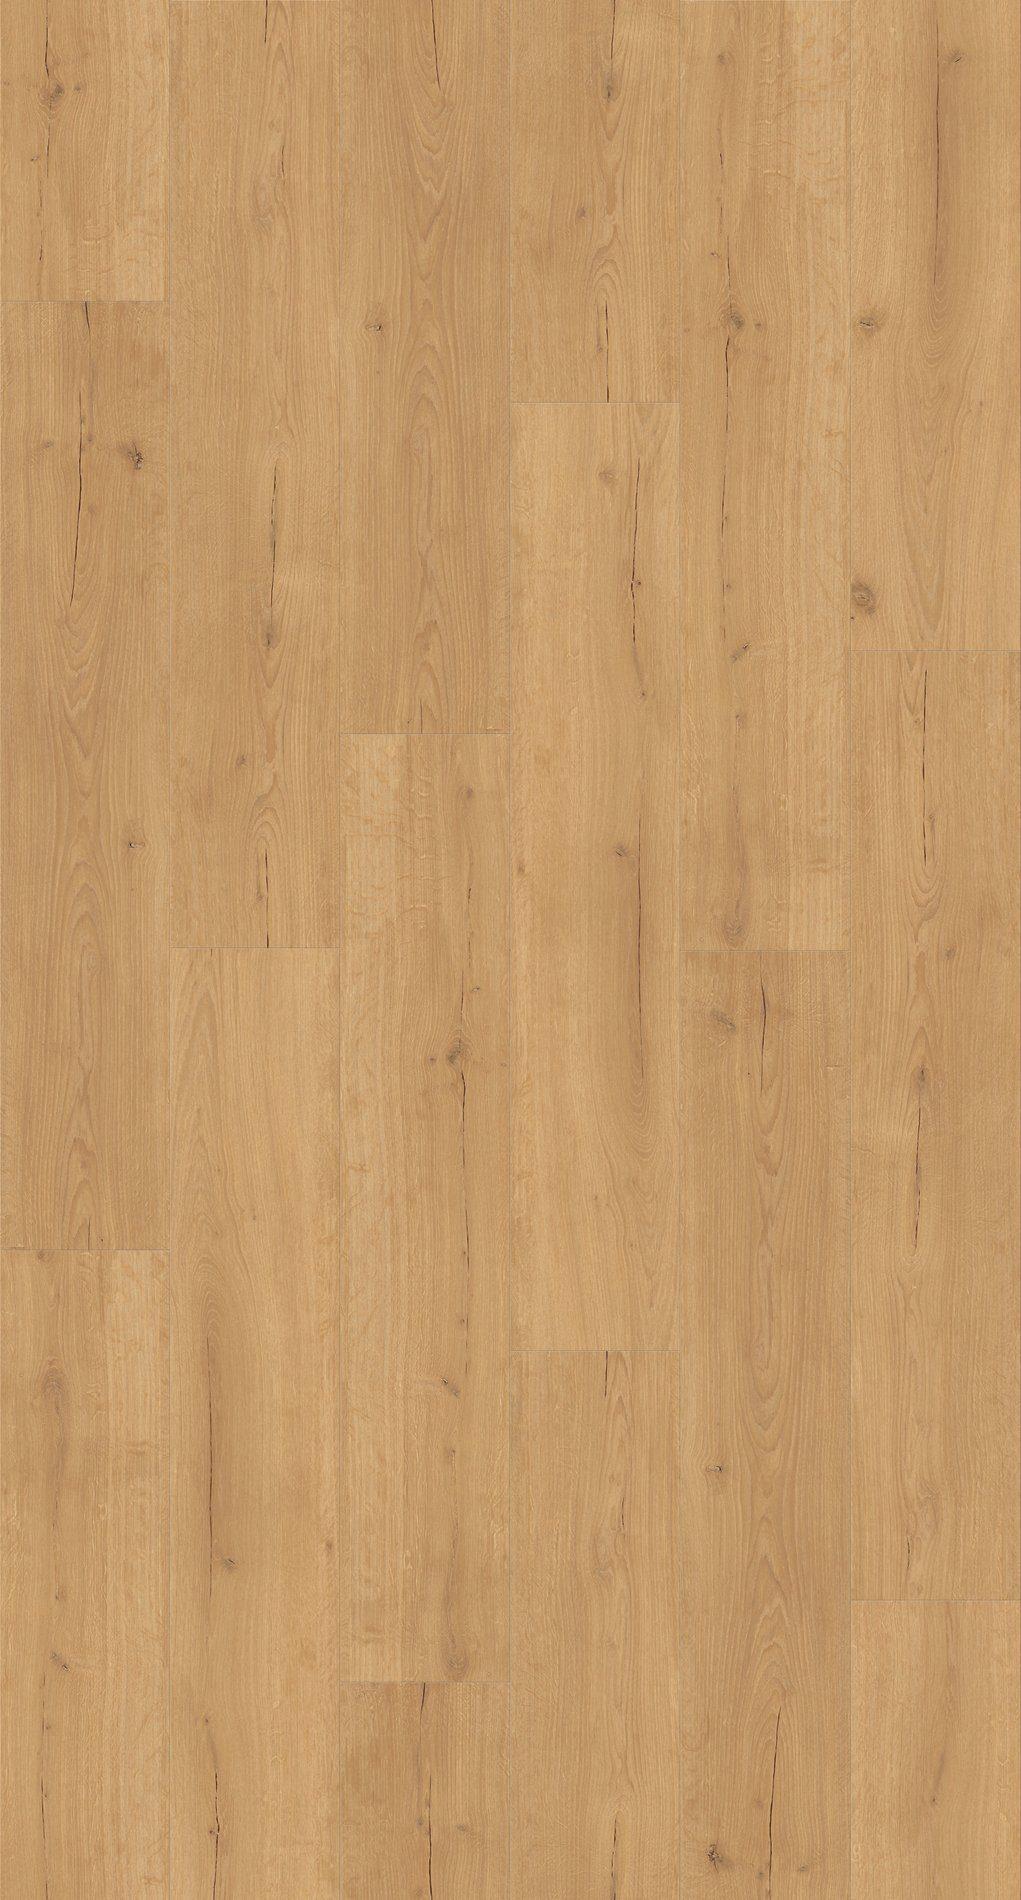 PARADOR Packung: Vinylboden »Basic 2.0 - Eiche Infinity Natur«, 1222 x 229 x 2 mm, 4,5 m²